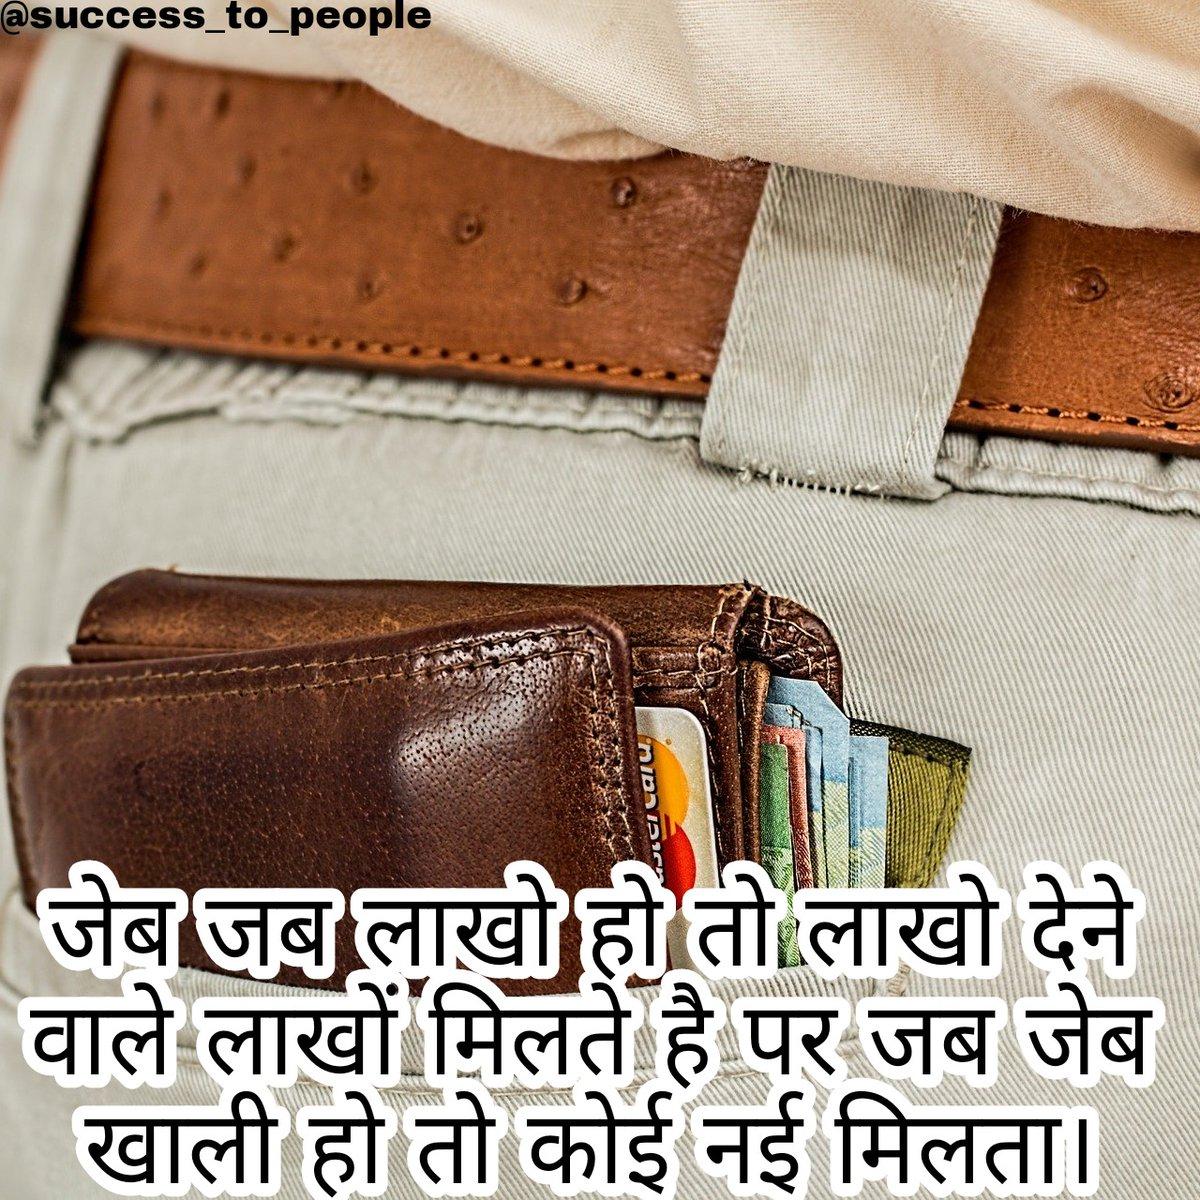 #succestopeople #successlife  #success #achivement  #kamiyabi #business #money #businessman #money #drvivekbindra #motivationspeaker  #businesscoach #knowledge  #india  #ahmebadad #morningmotivation #positive https://t.co/qYaOlmfmIa